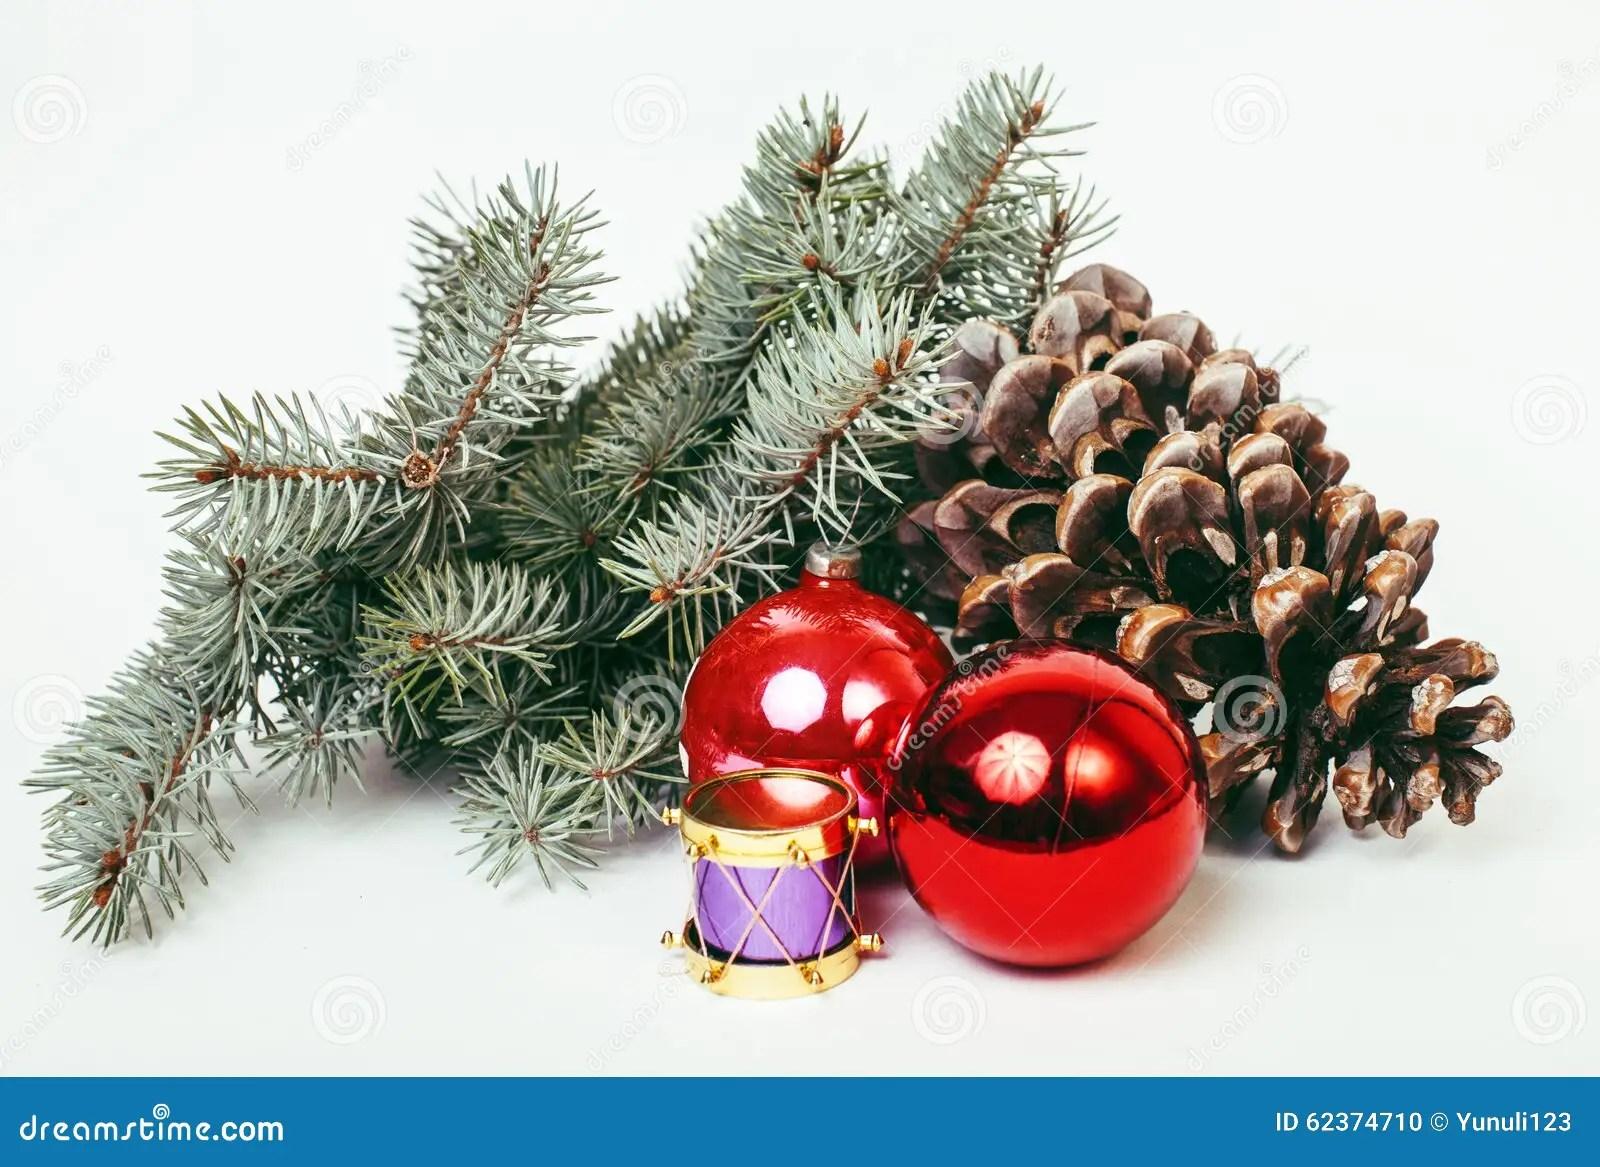 New Year Celebration Christmas Holiday Stuff Stock Photo